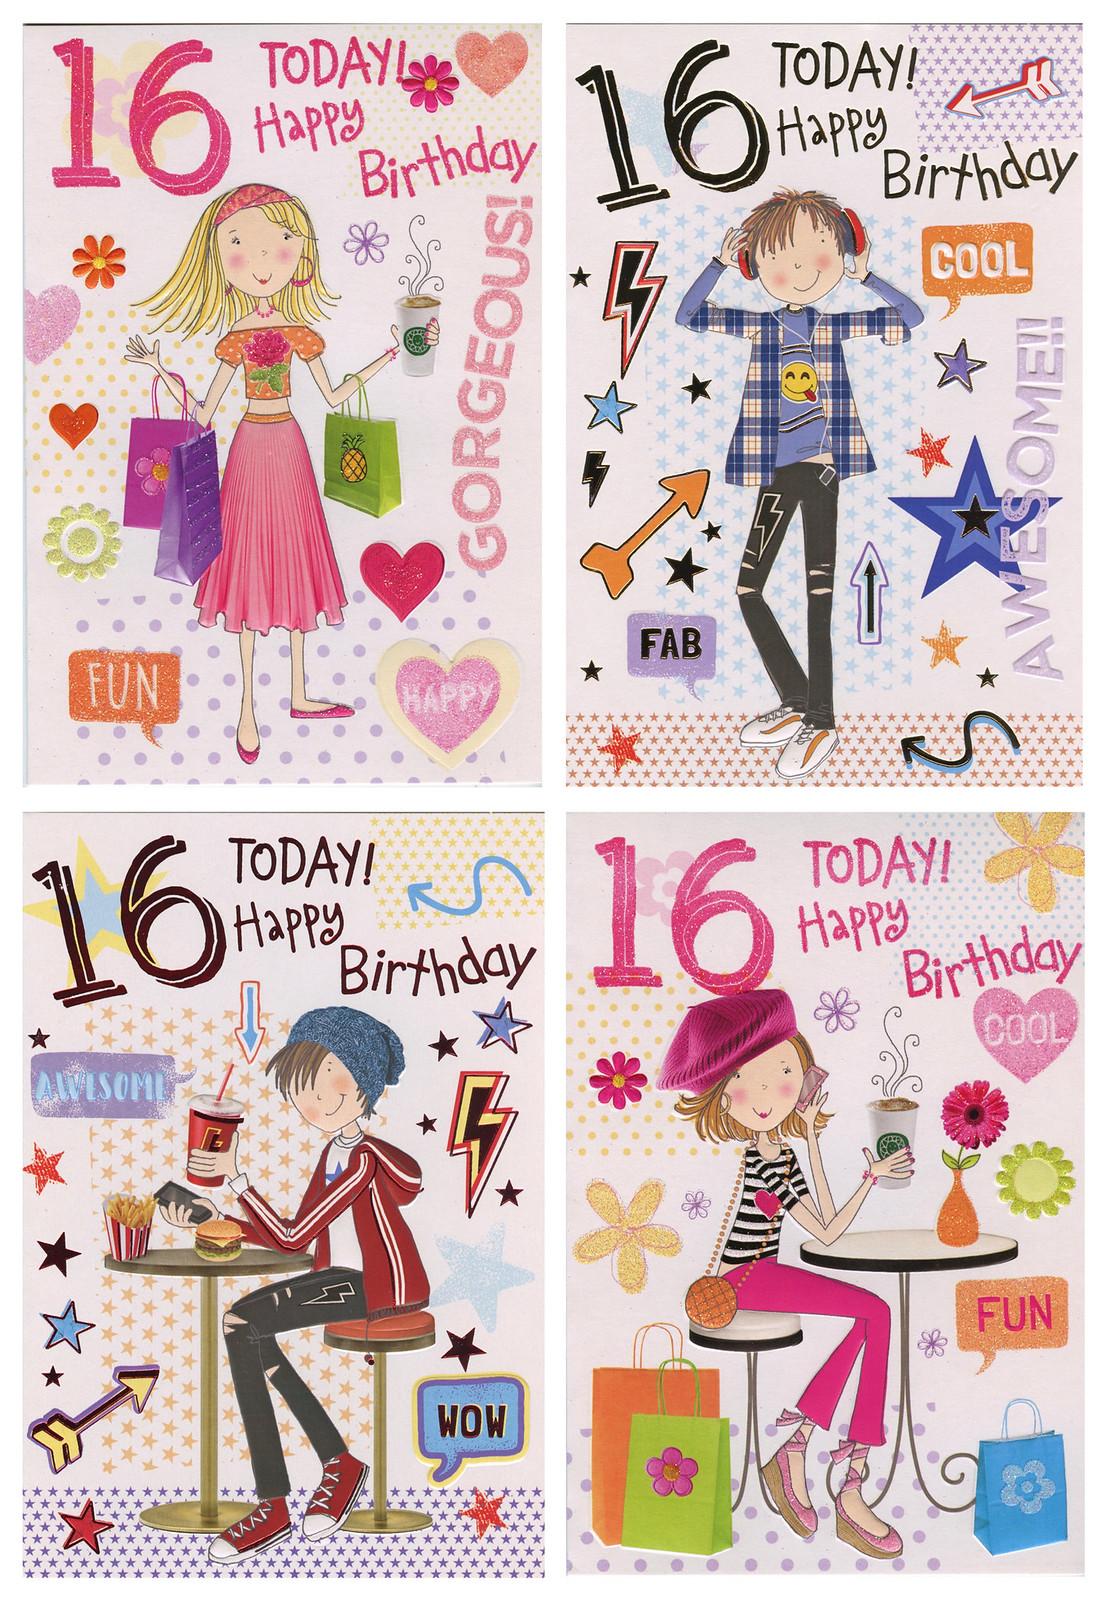 Cute Boy Girl 16 Today Birthday Card 1stp P 16th Birthday Card